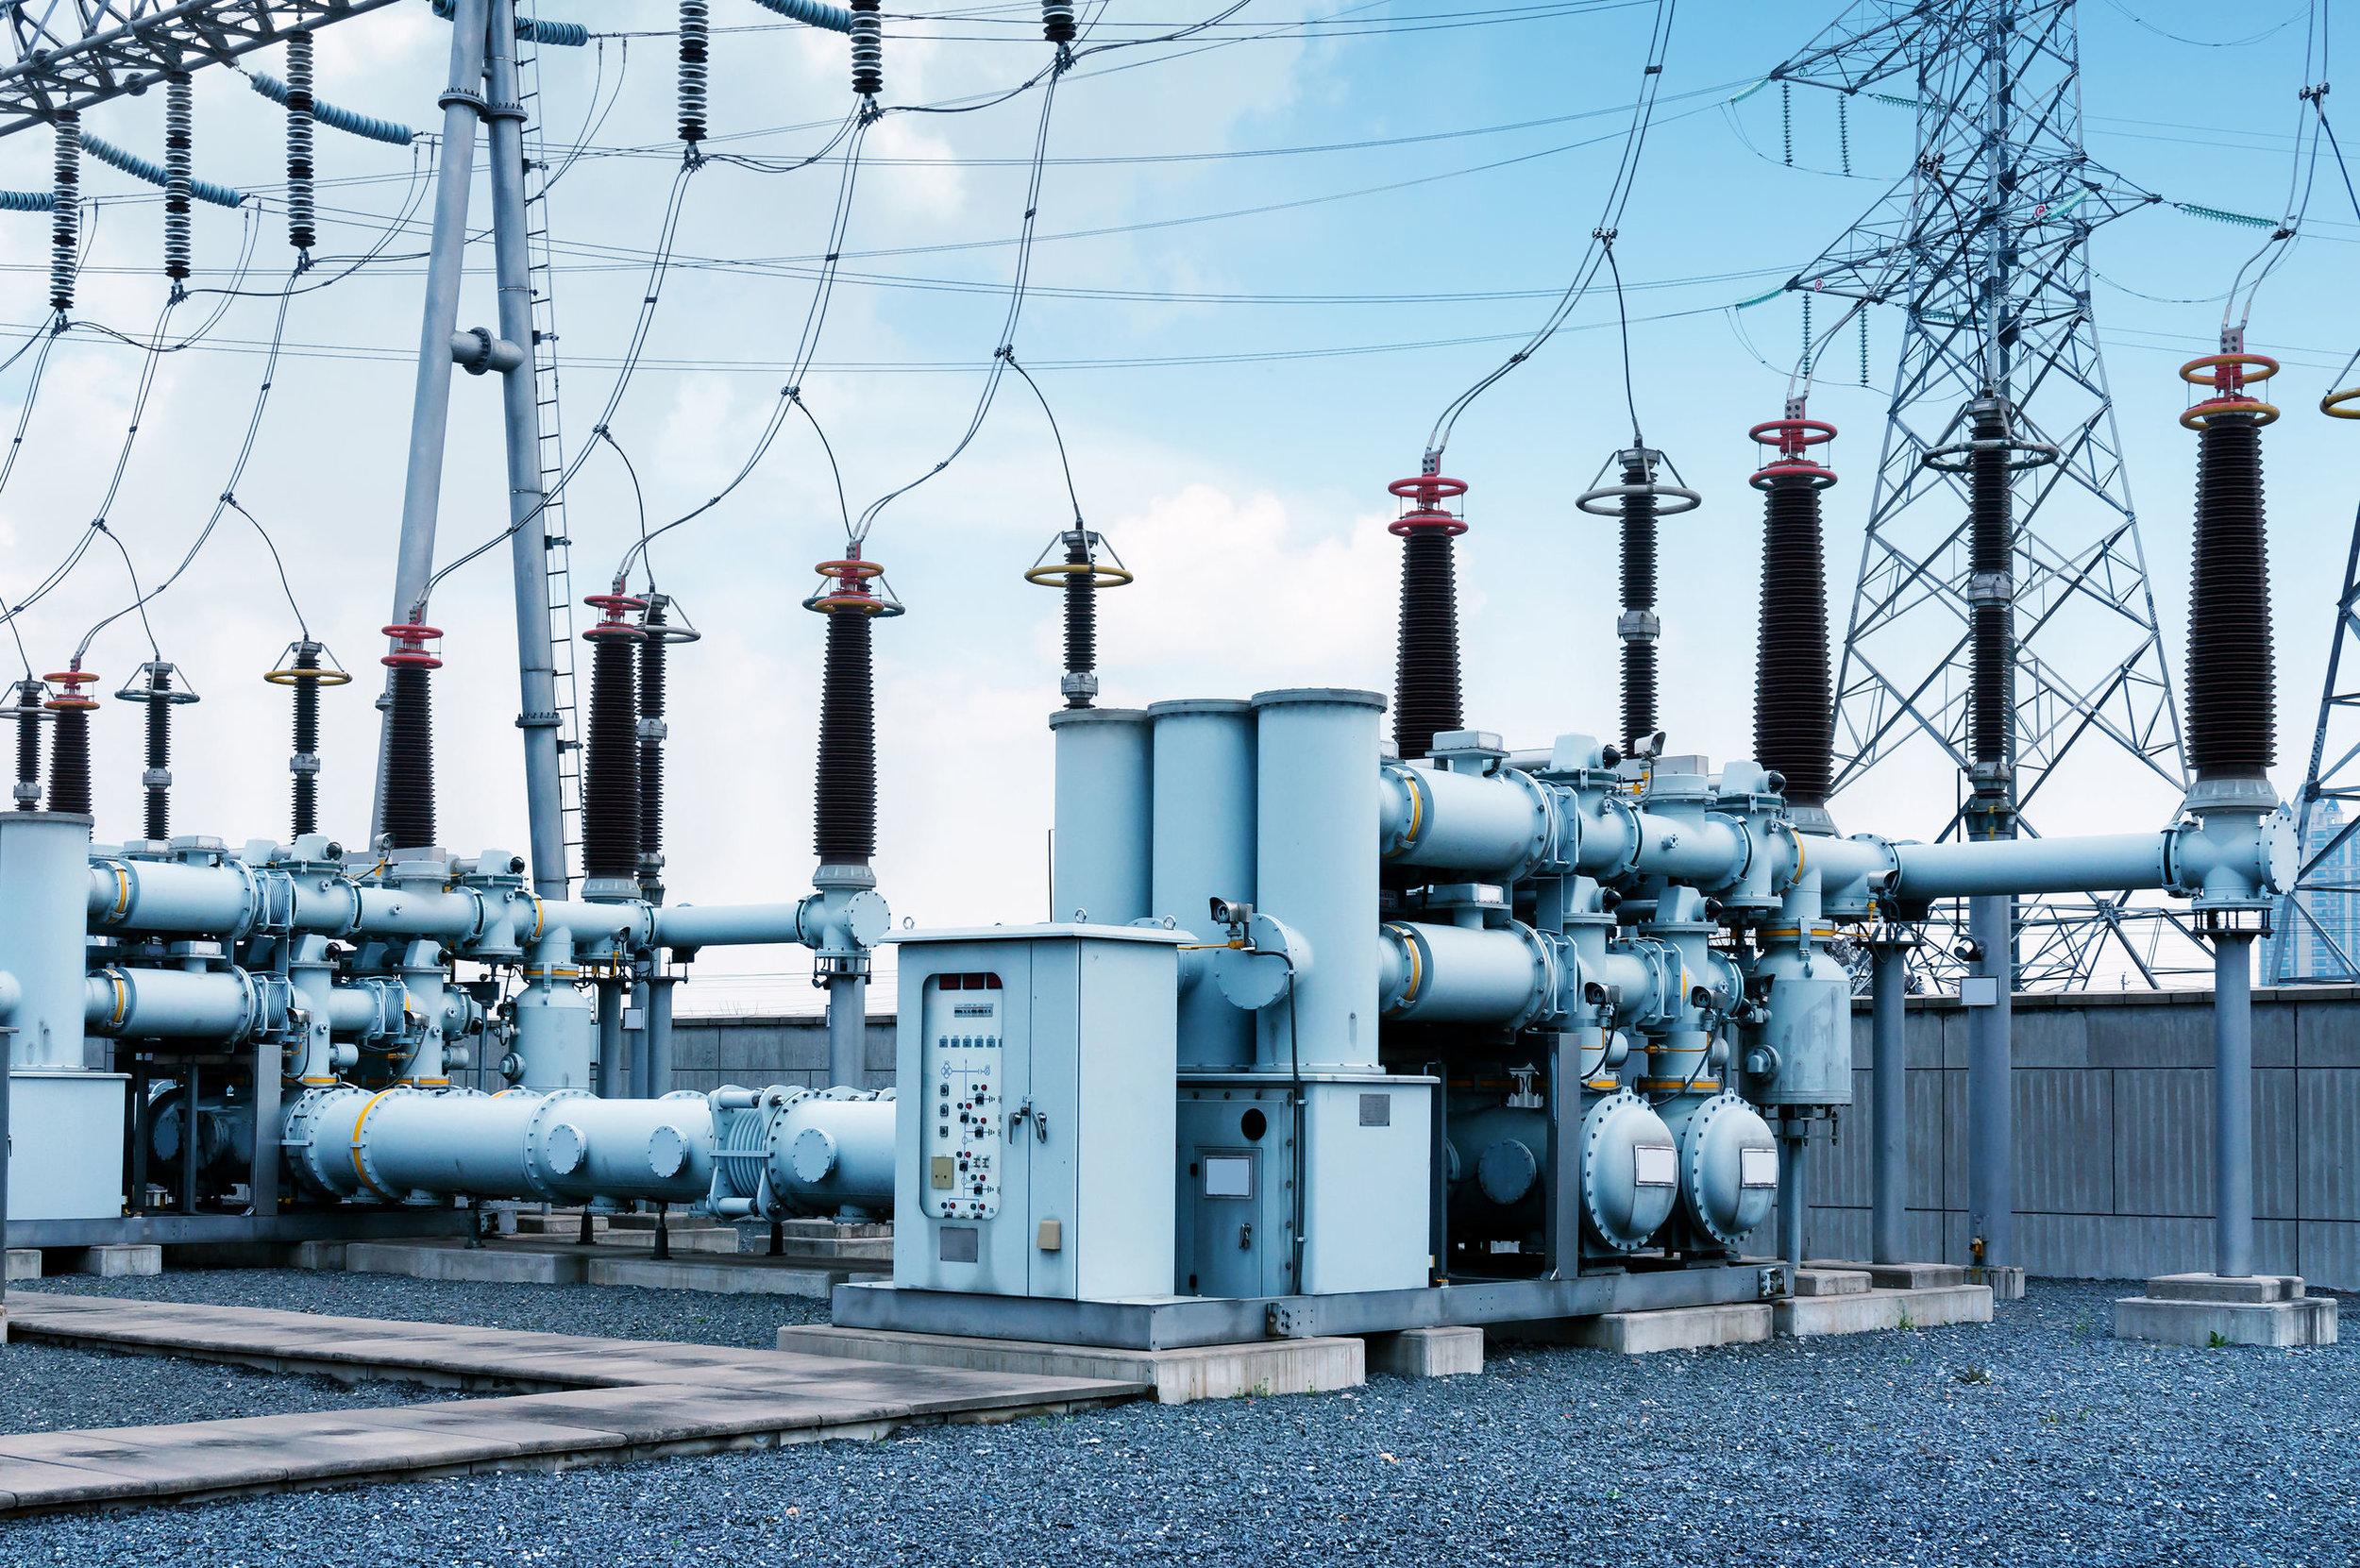 Sked Electric - Best Electrician in CT - Essex CT.jpg